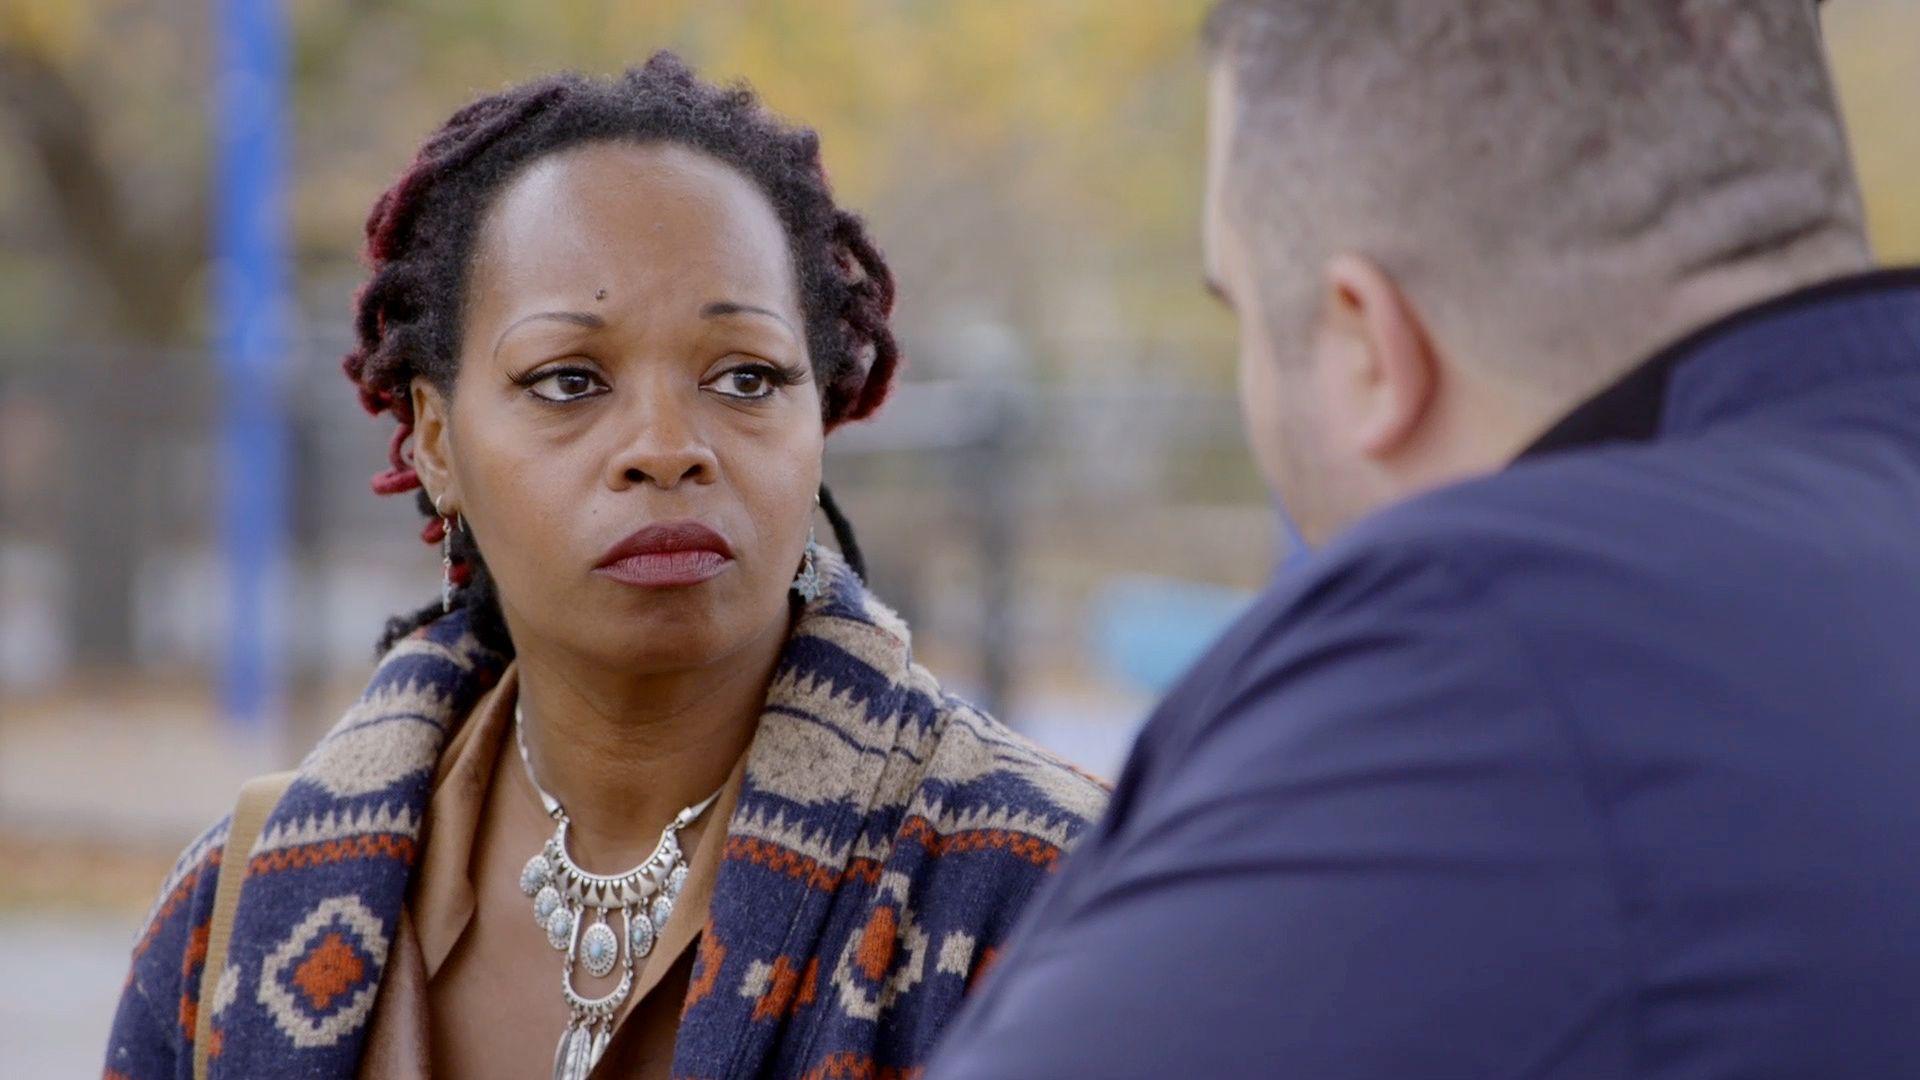 Teary-eyed woman on park bench talks to Thomas John